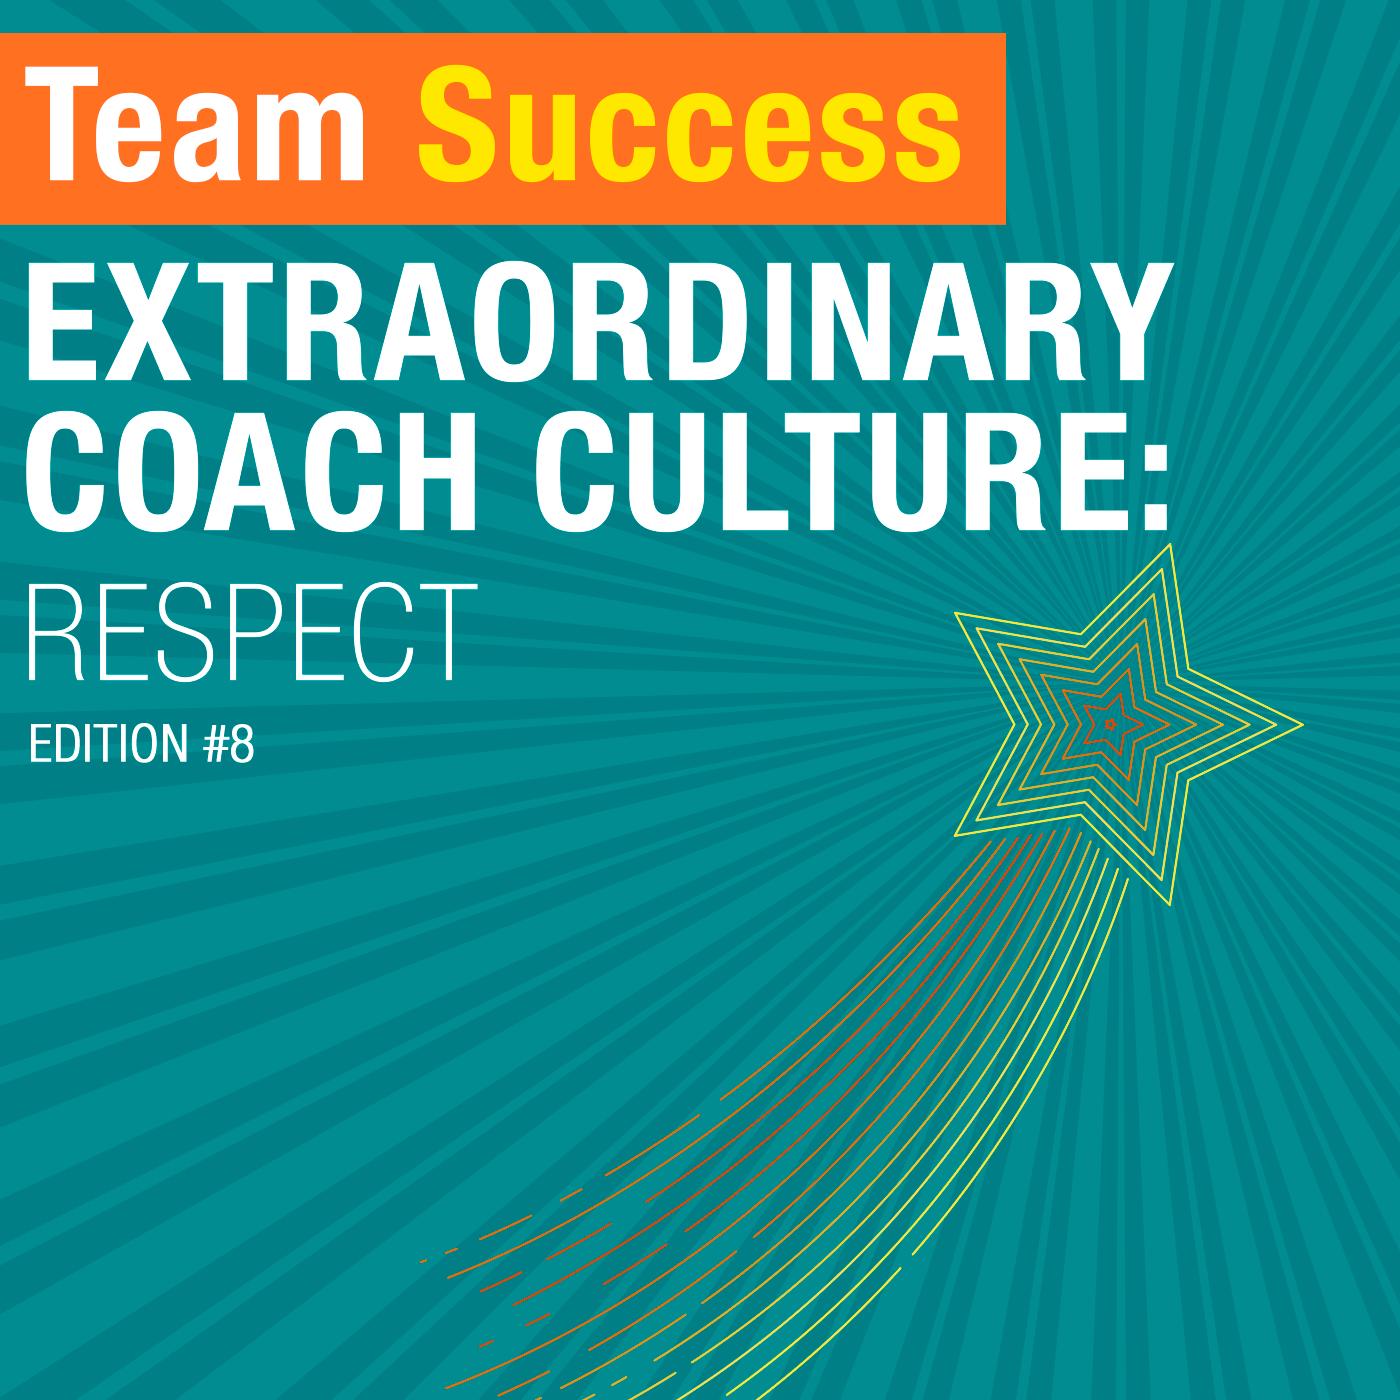 Extraordinary Coach Culture: Respect